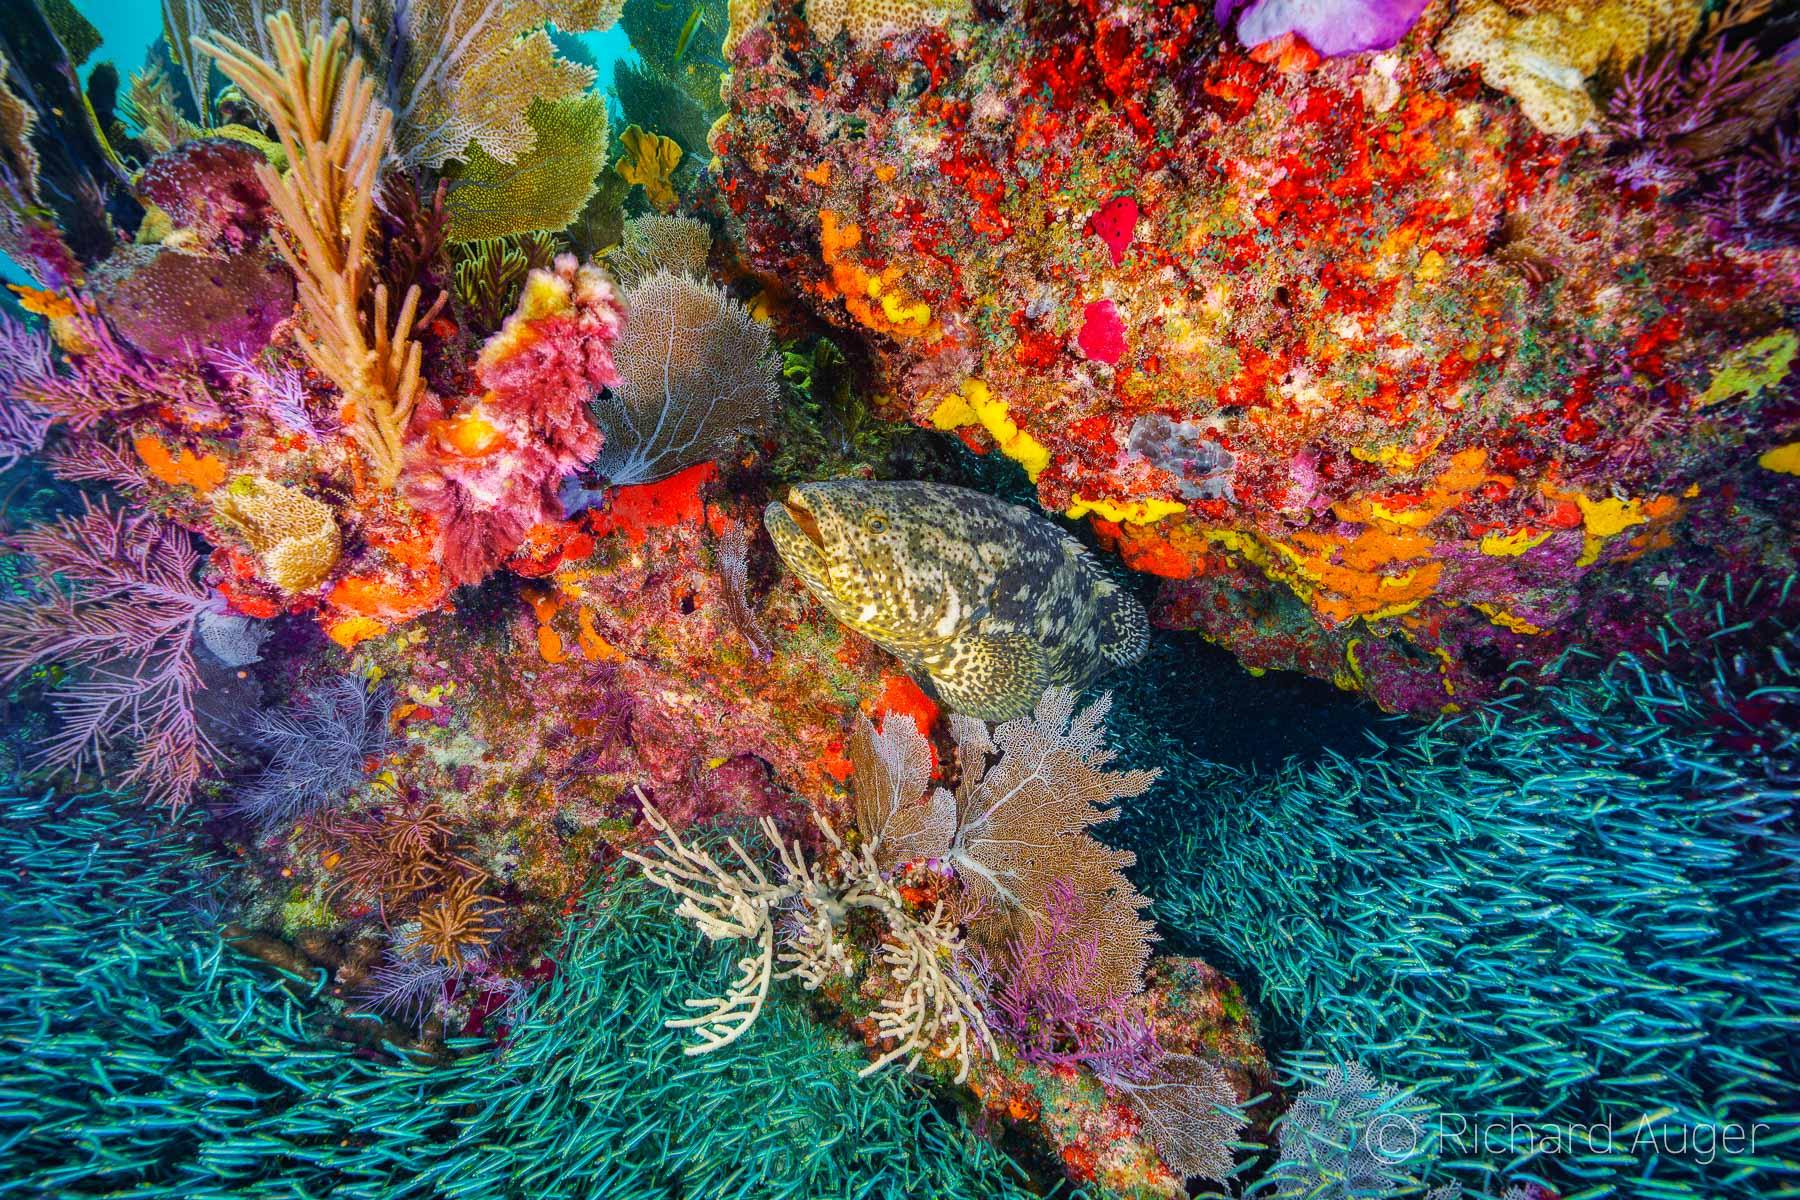 Goliath Grouper, Minnows, Reef, Banana Patch Reef, Key Largo, Florida Keys, Underwater Photography, Scuba